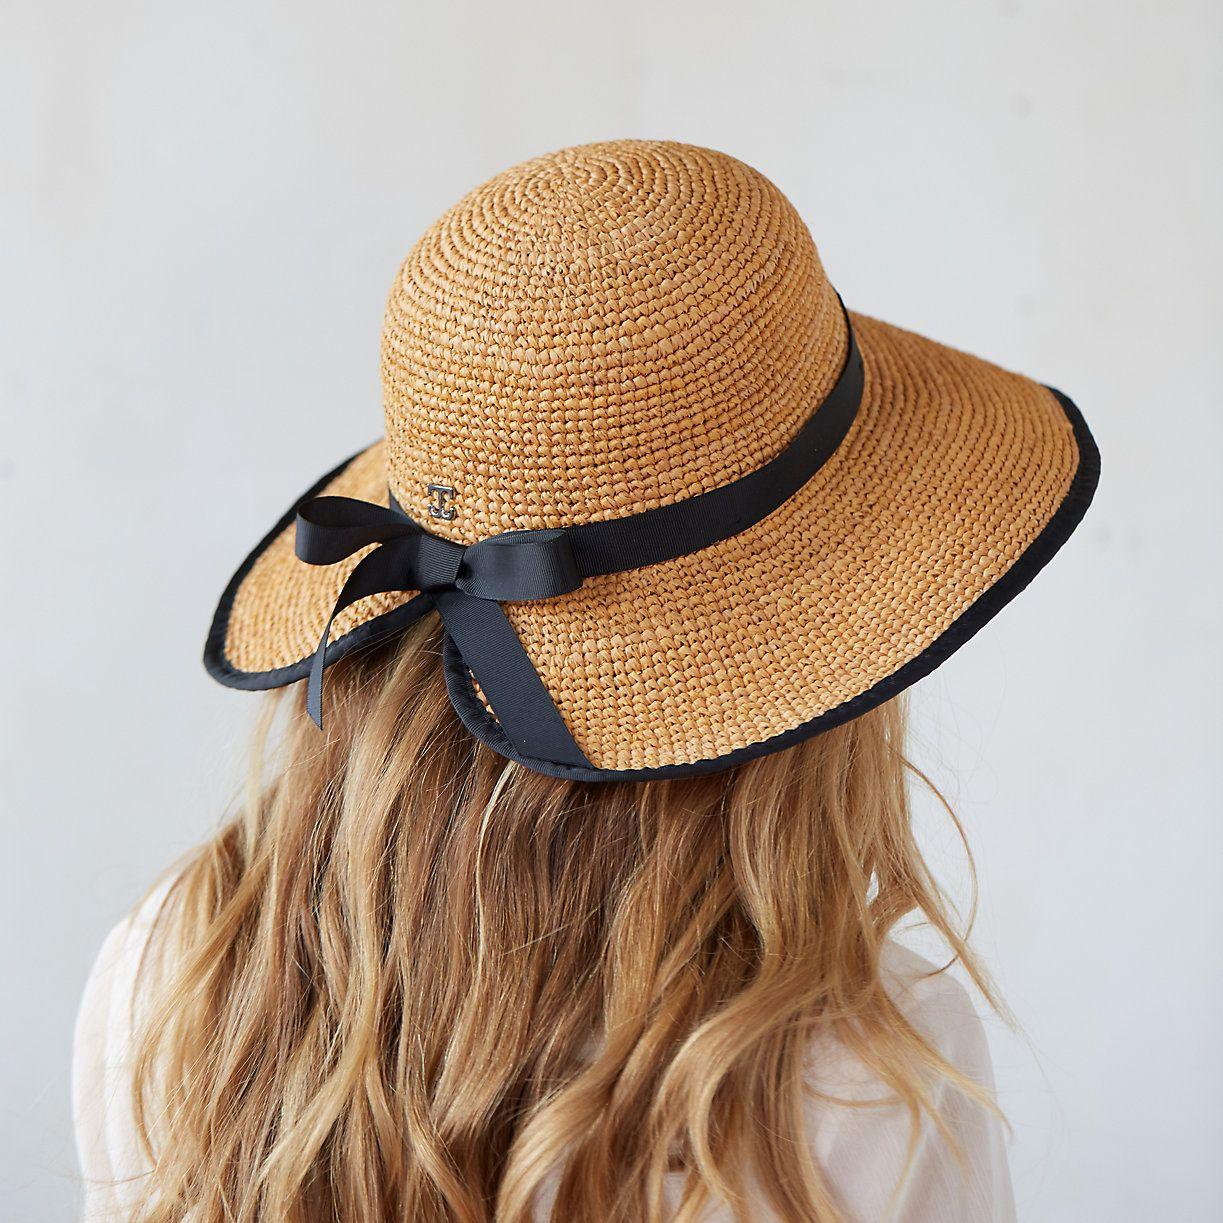 Adjustable Raffia Sun Hat Terrain Raffia Sun Hat Summer Hats